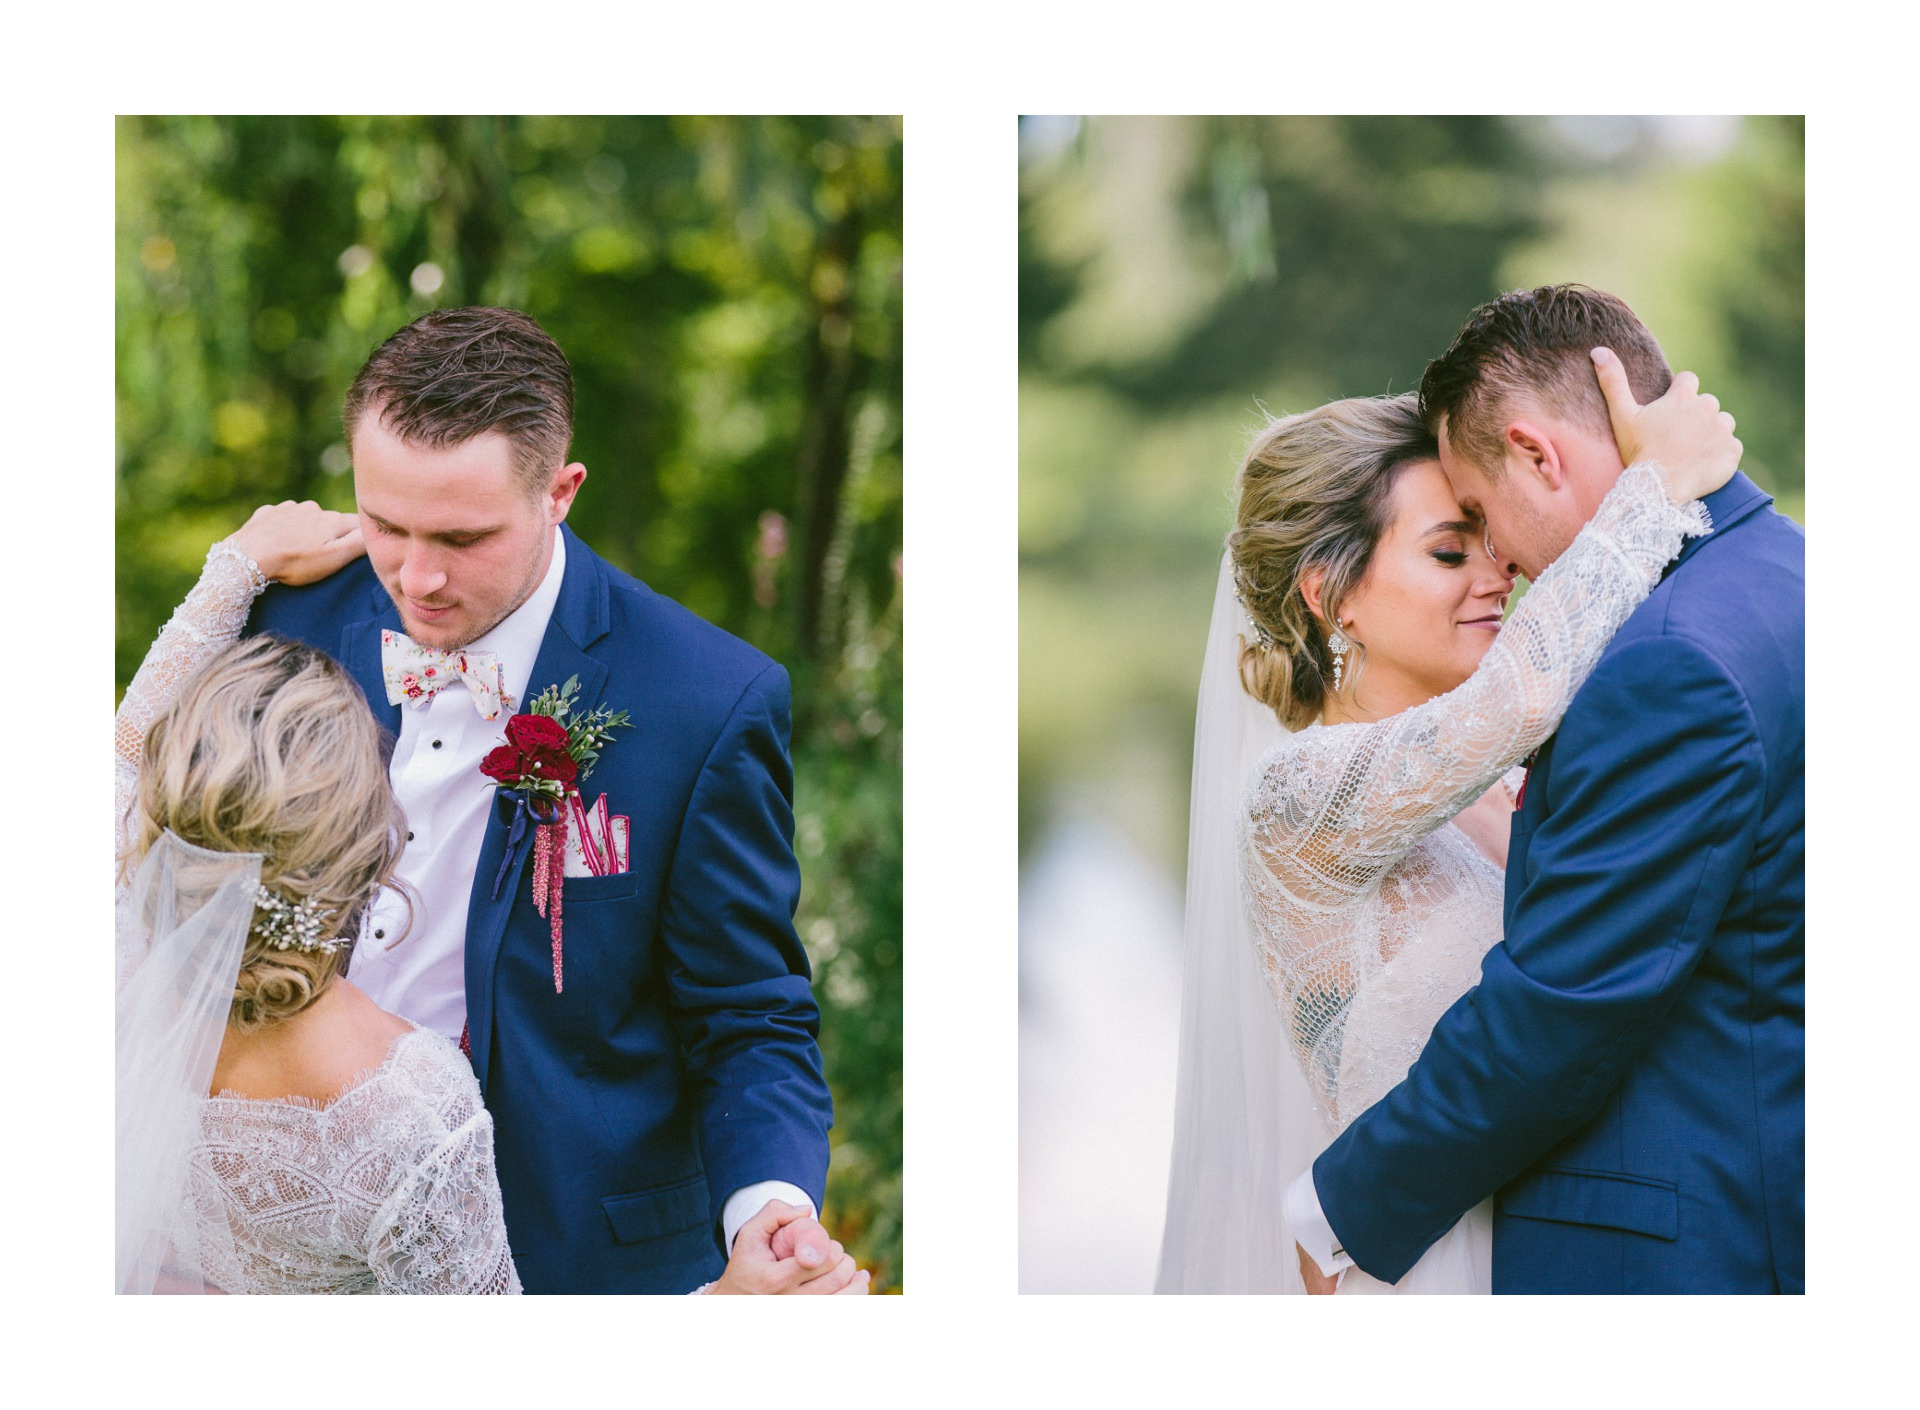 Meadow Ridge Farm Wedding Photos in Windsor 1 50.jpg